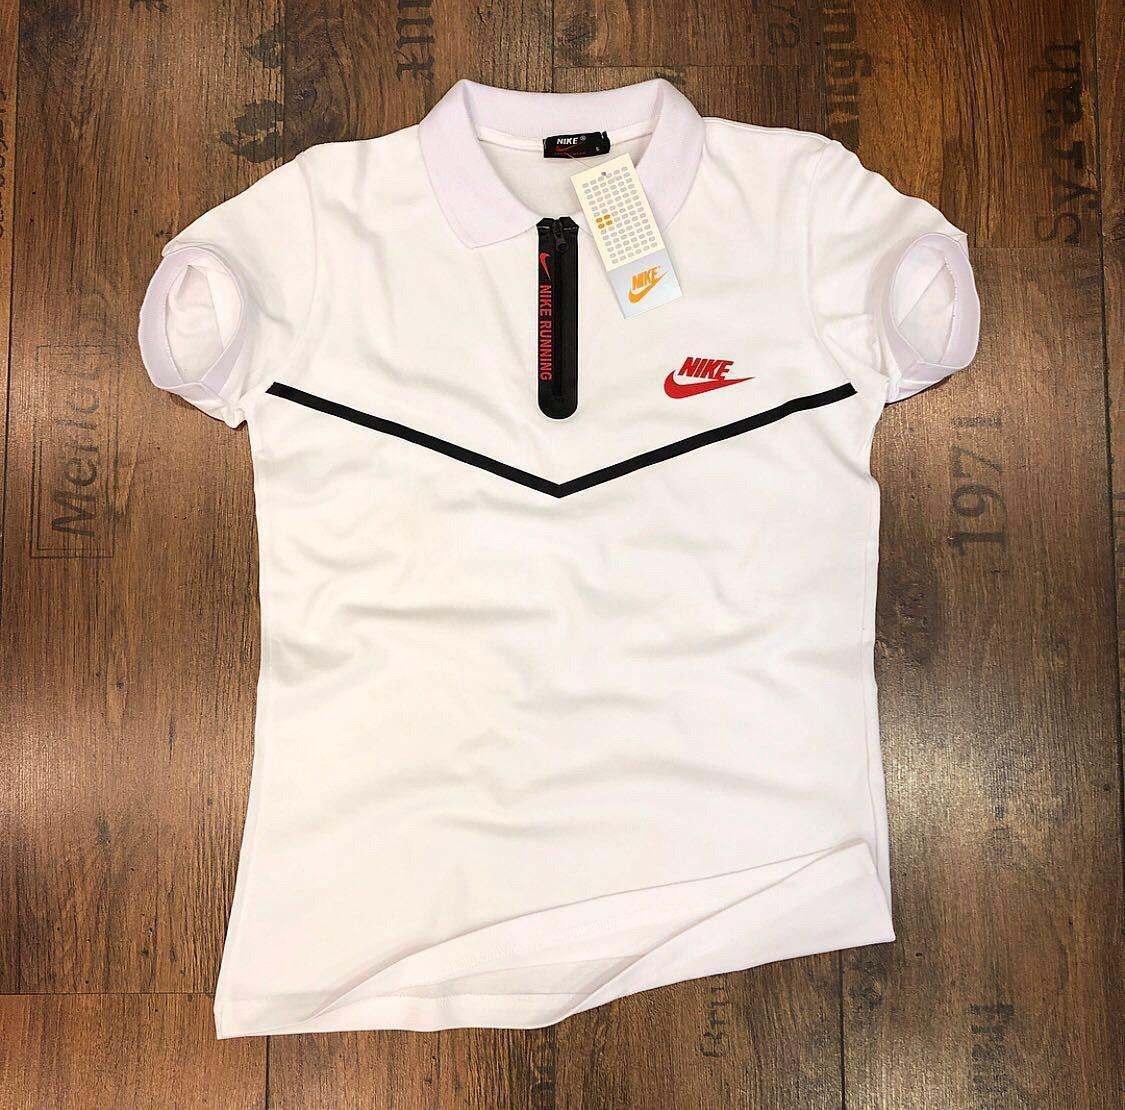 6de397089d2d3 Мужская футболка поло Nike белая (реплика): продажа, цена в Днепре ...